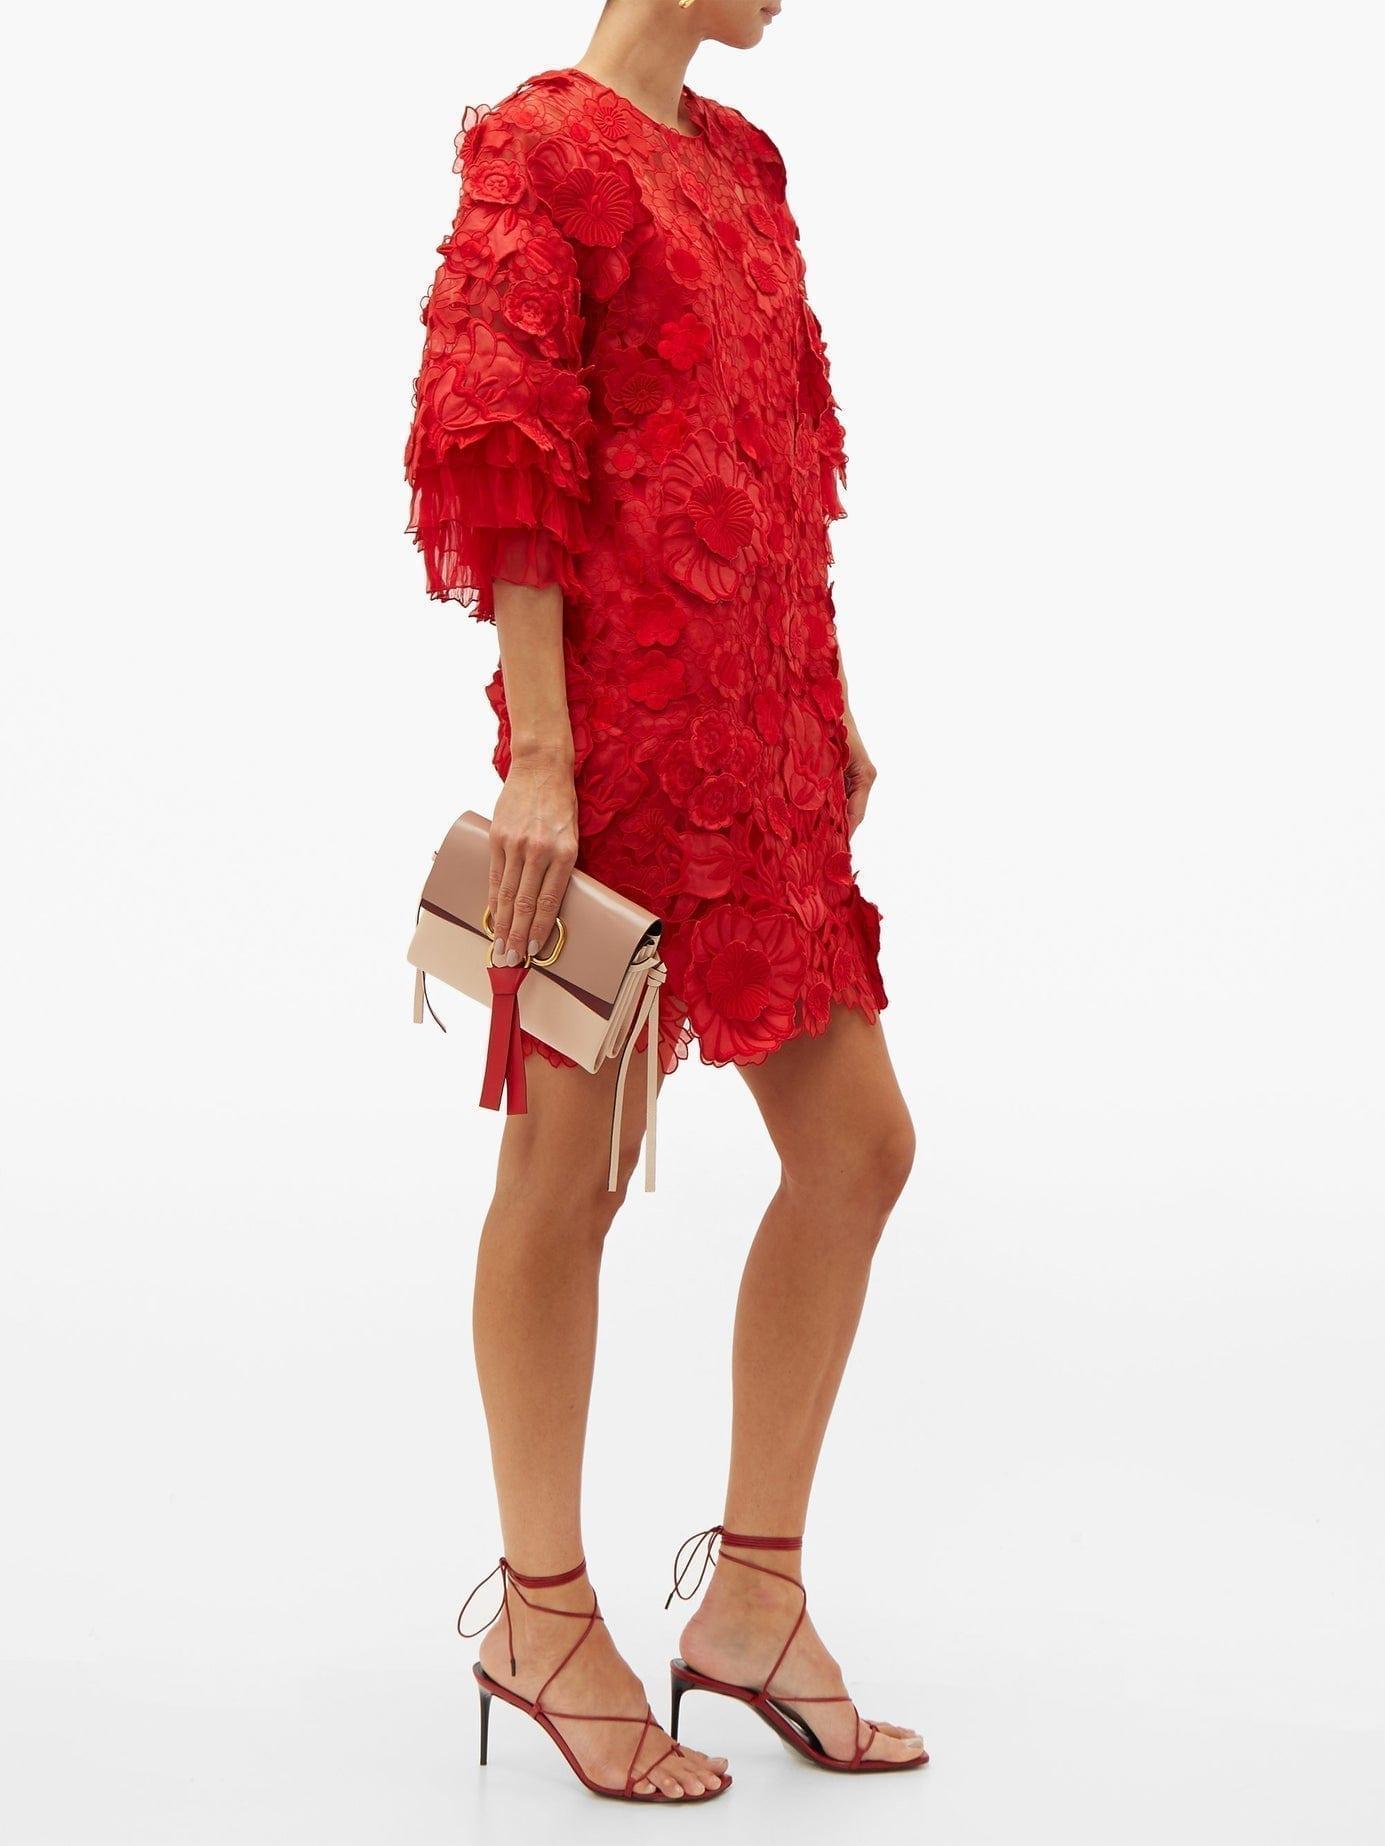 VALENTINO Guipure Floral Appliqué & Mesh Mini Red Dress